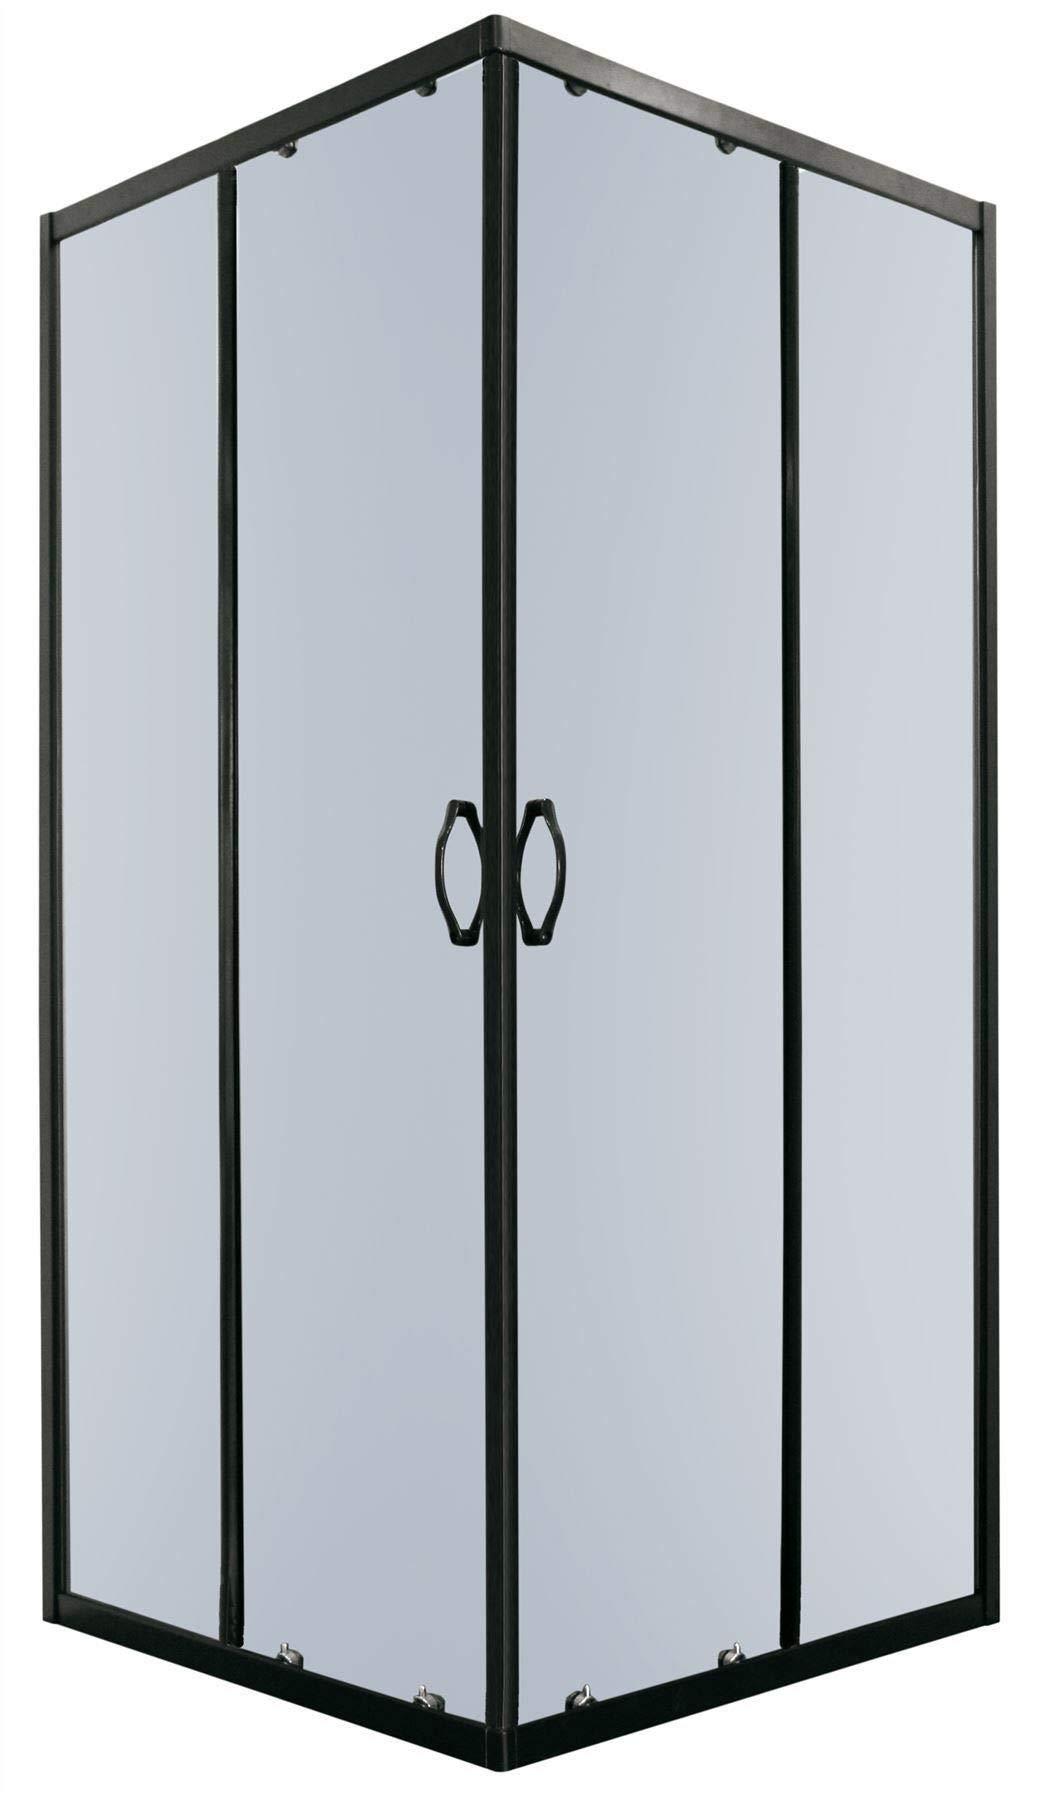 90x90cm Cuadrado Esquina Cabina Ducha Baño Negro Perfiles Aluminio: Amazon.es: Hogar